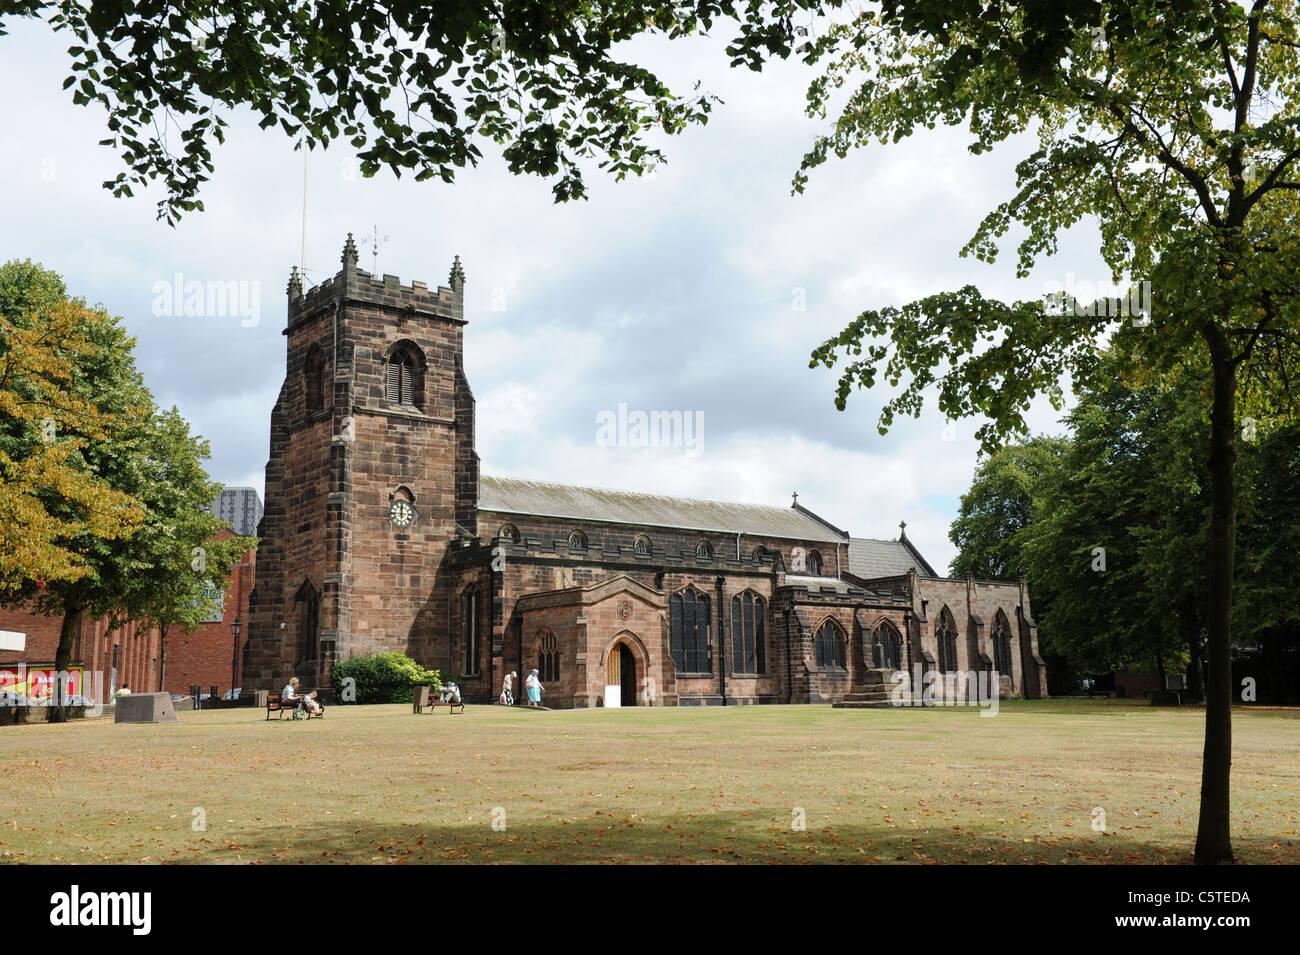 St. Luke's Church Cannock Staffordshire Uk - Stock Image